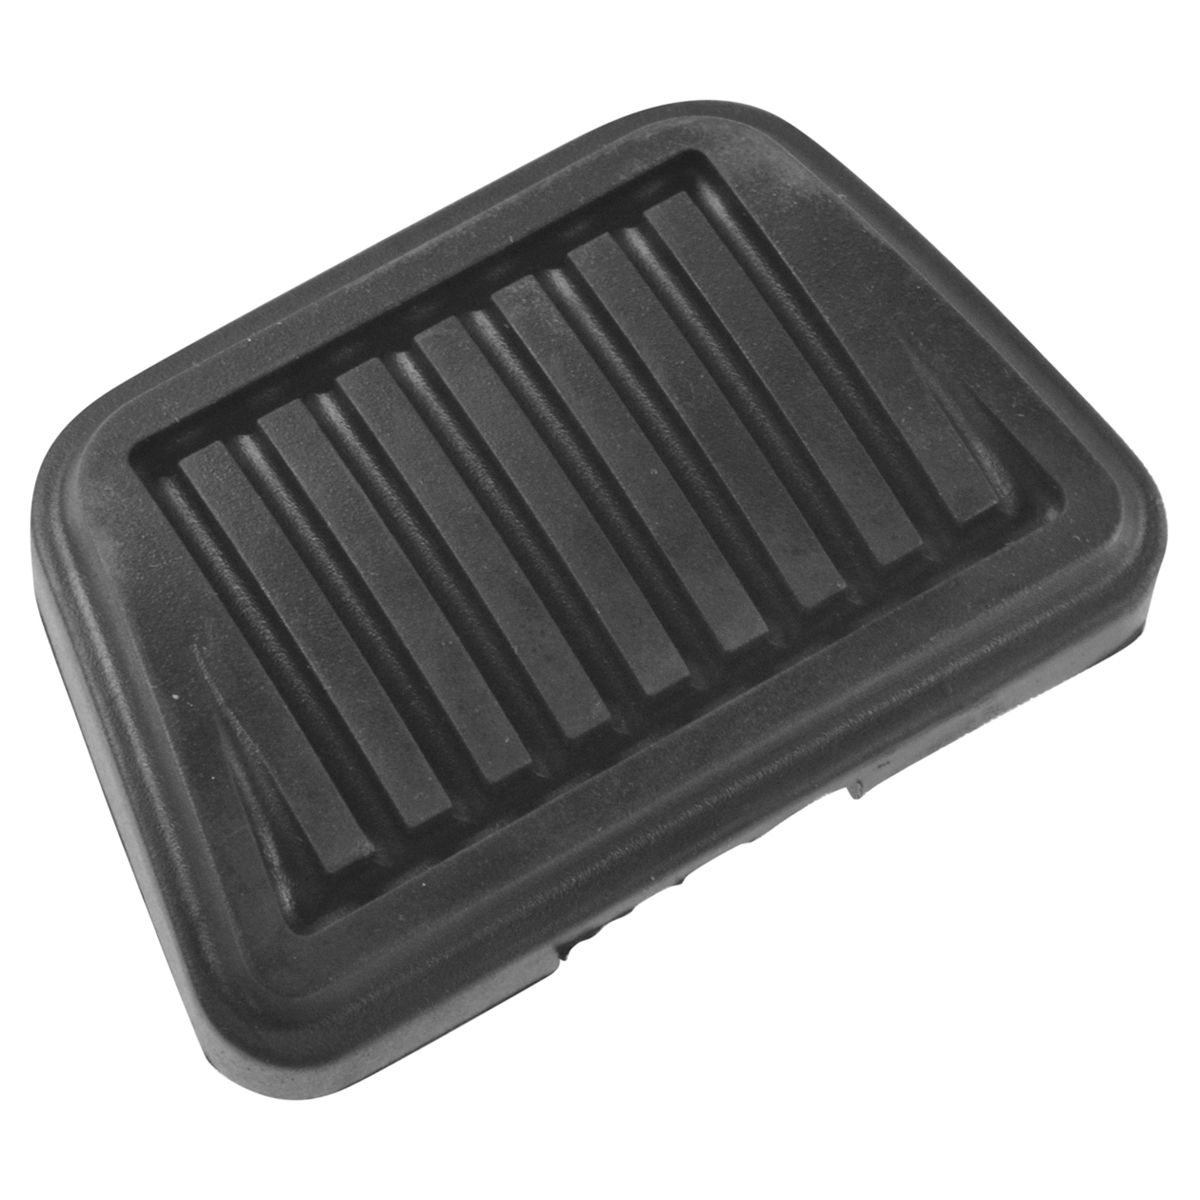 Crown Automotive 52009562 Crown Pedal Pad